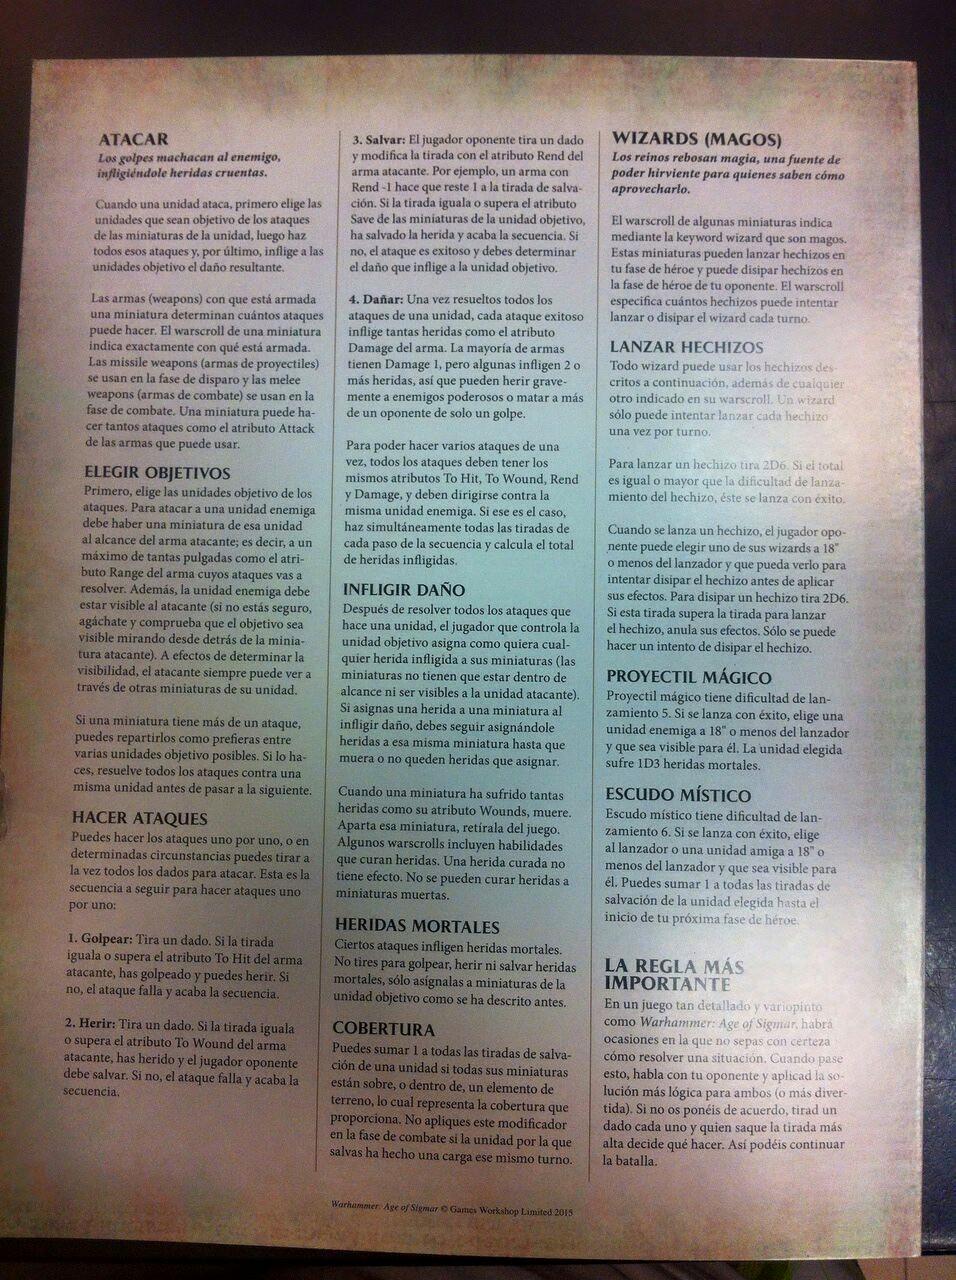 Warhammer Age of Sigmar Reglas 4